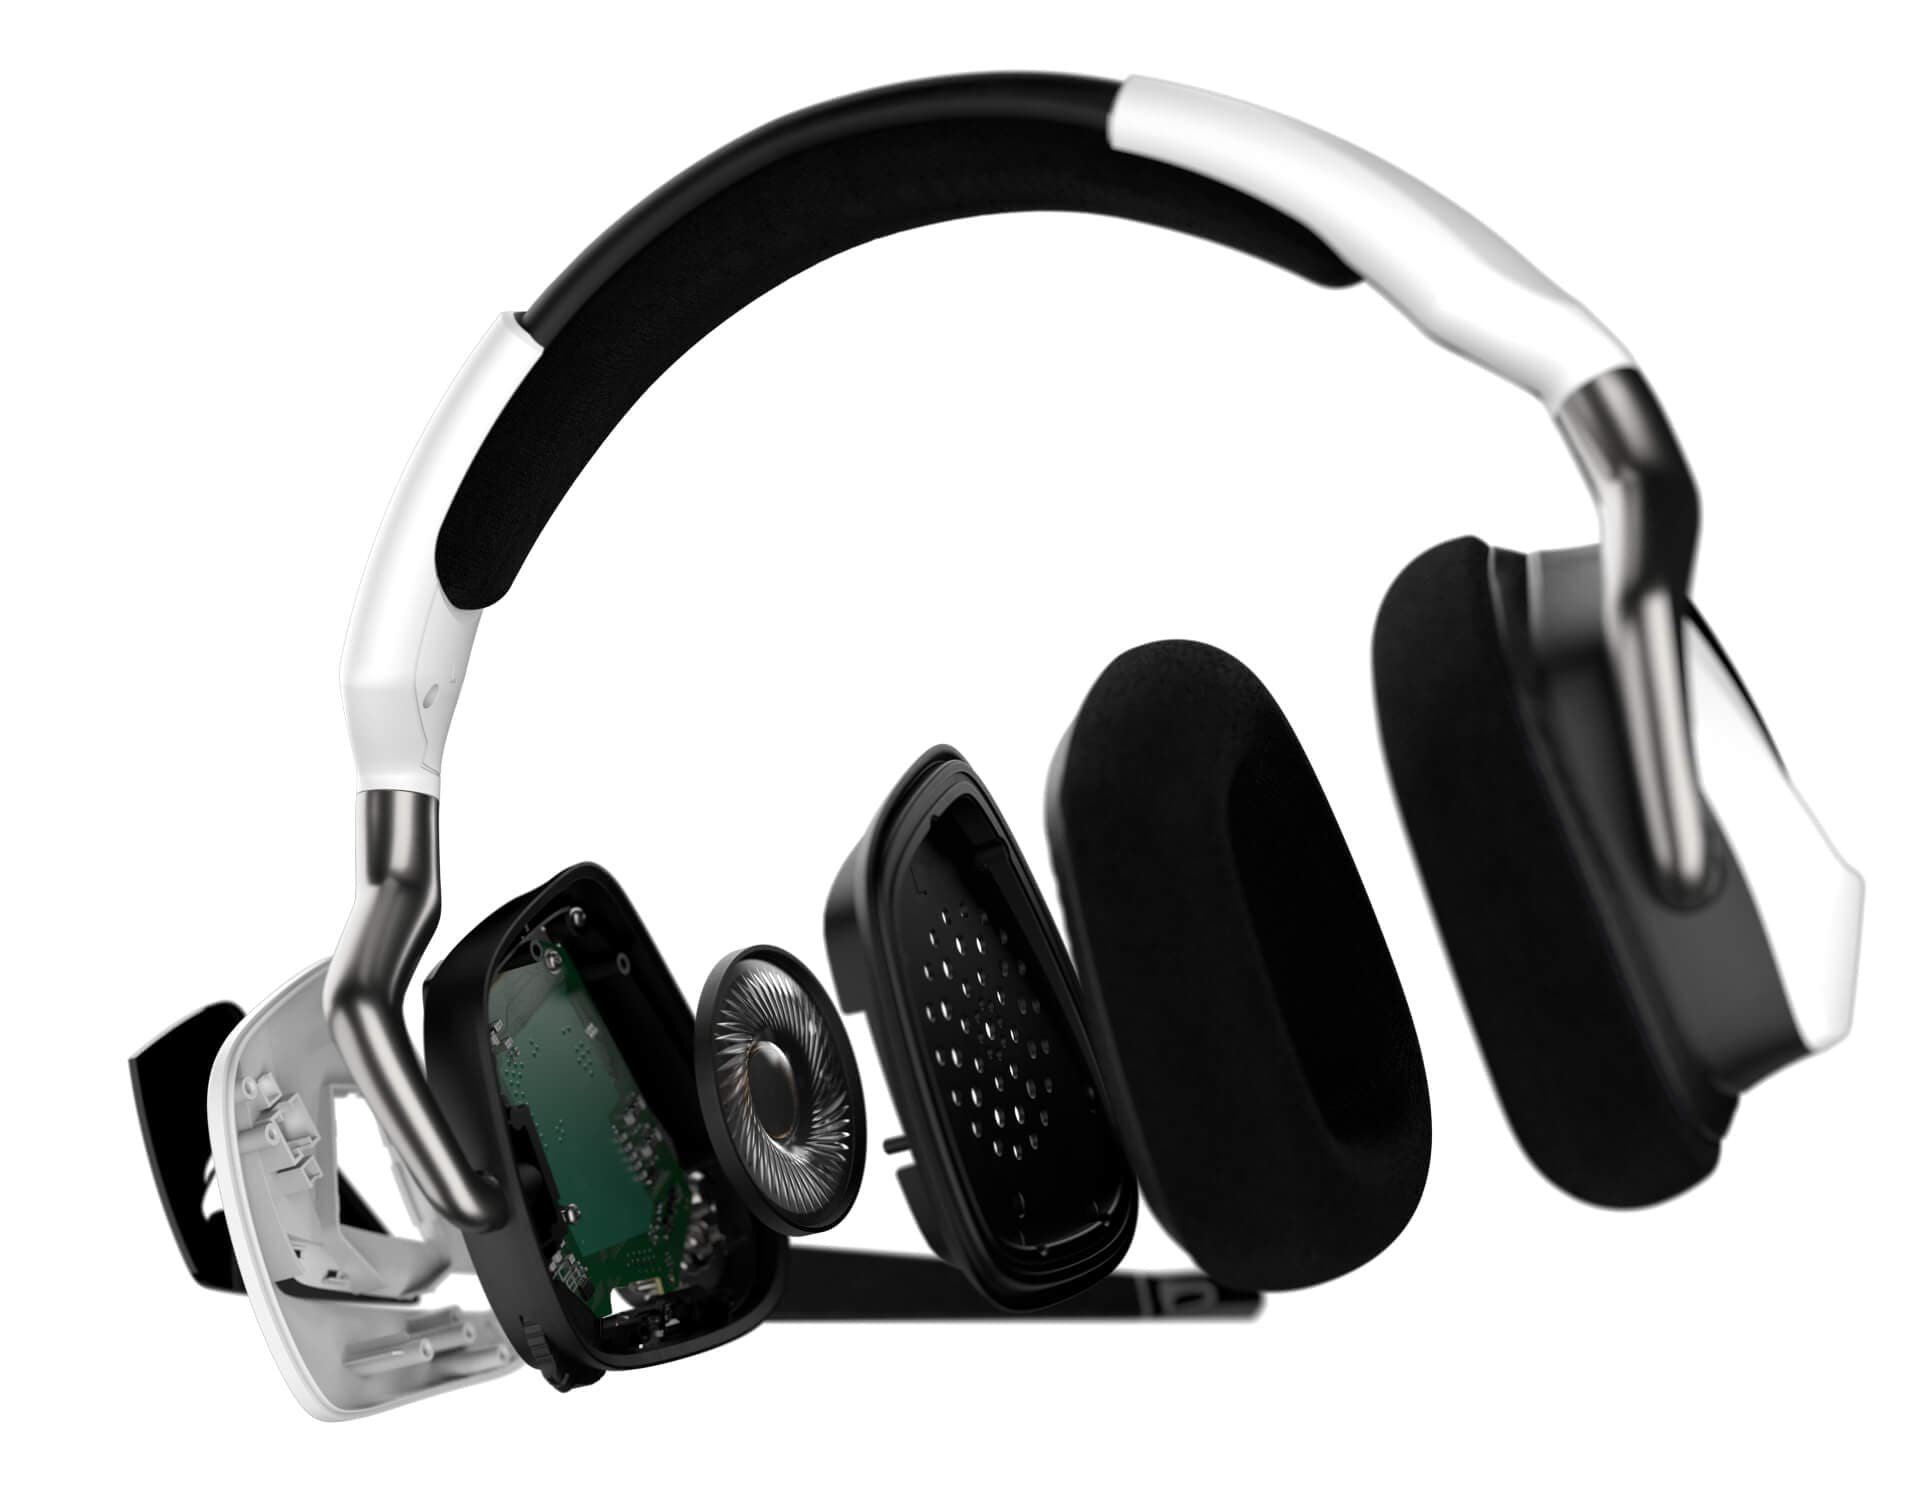 Corsair VOID RGB ELITE USB Premium Gaming Headset with 7.1 Surround Sound — White 18